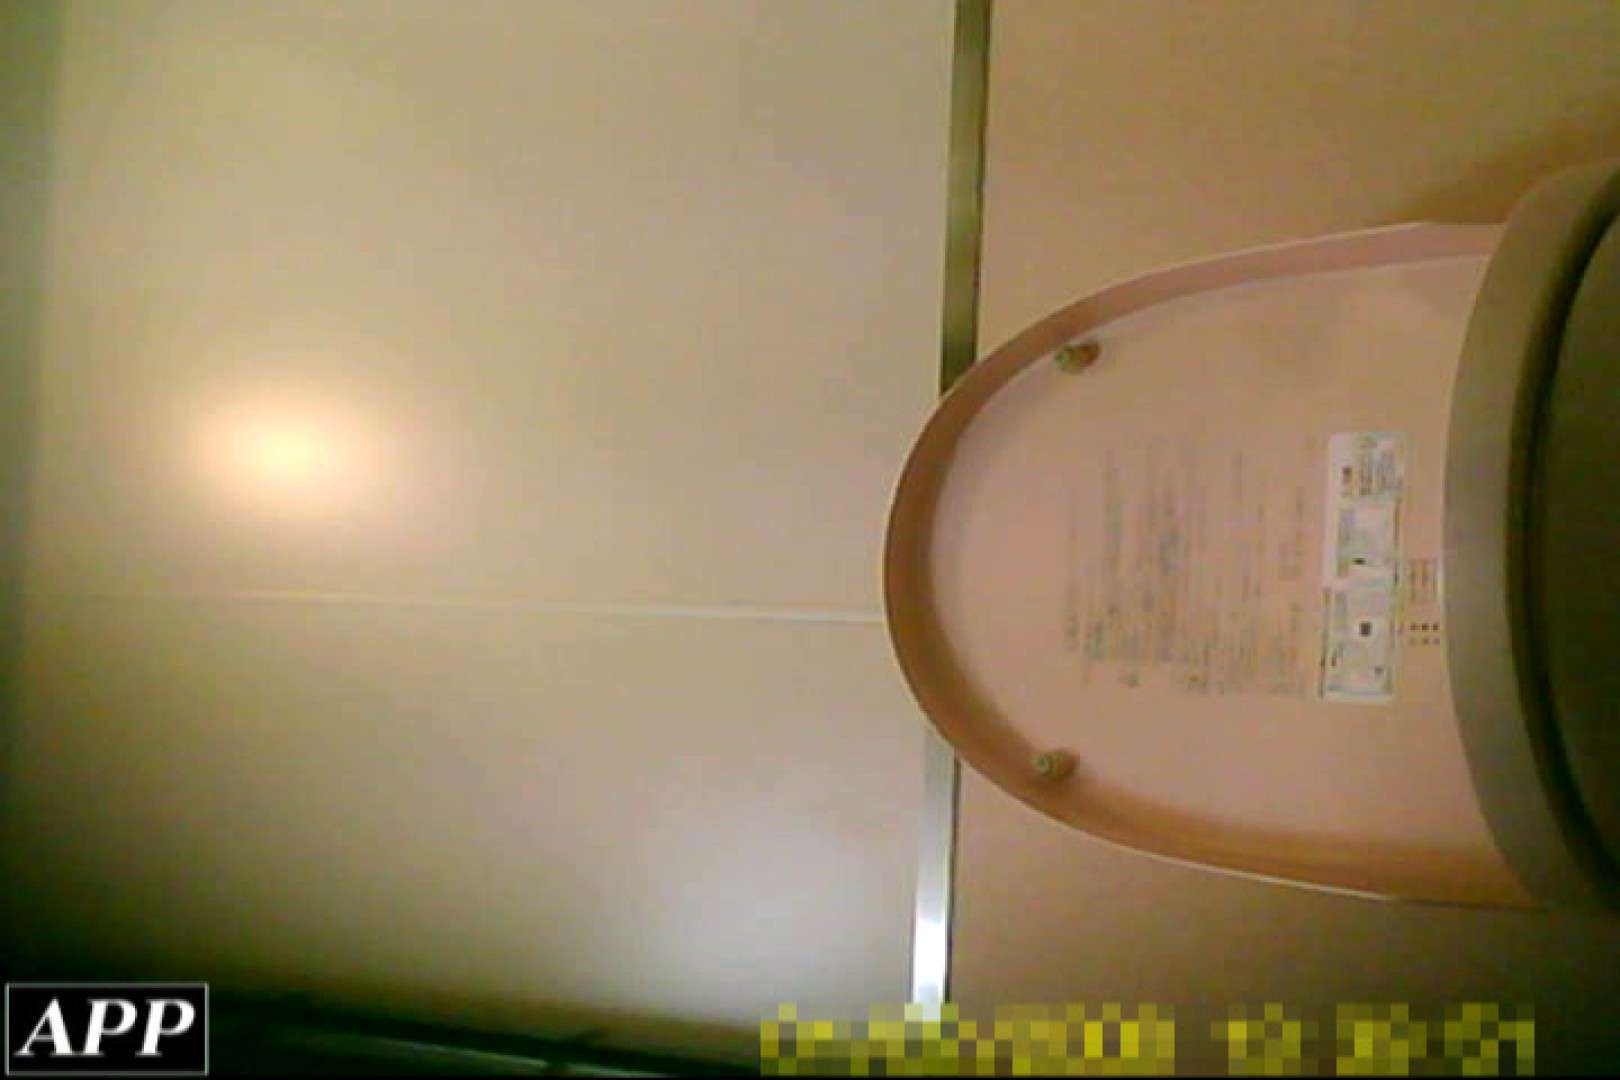 3視点洗面所 vol.092 洗面所 | OLセックス  101画像 69